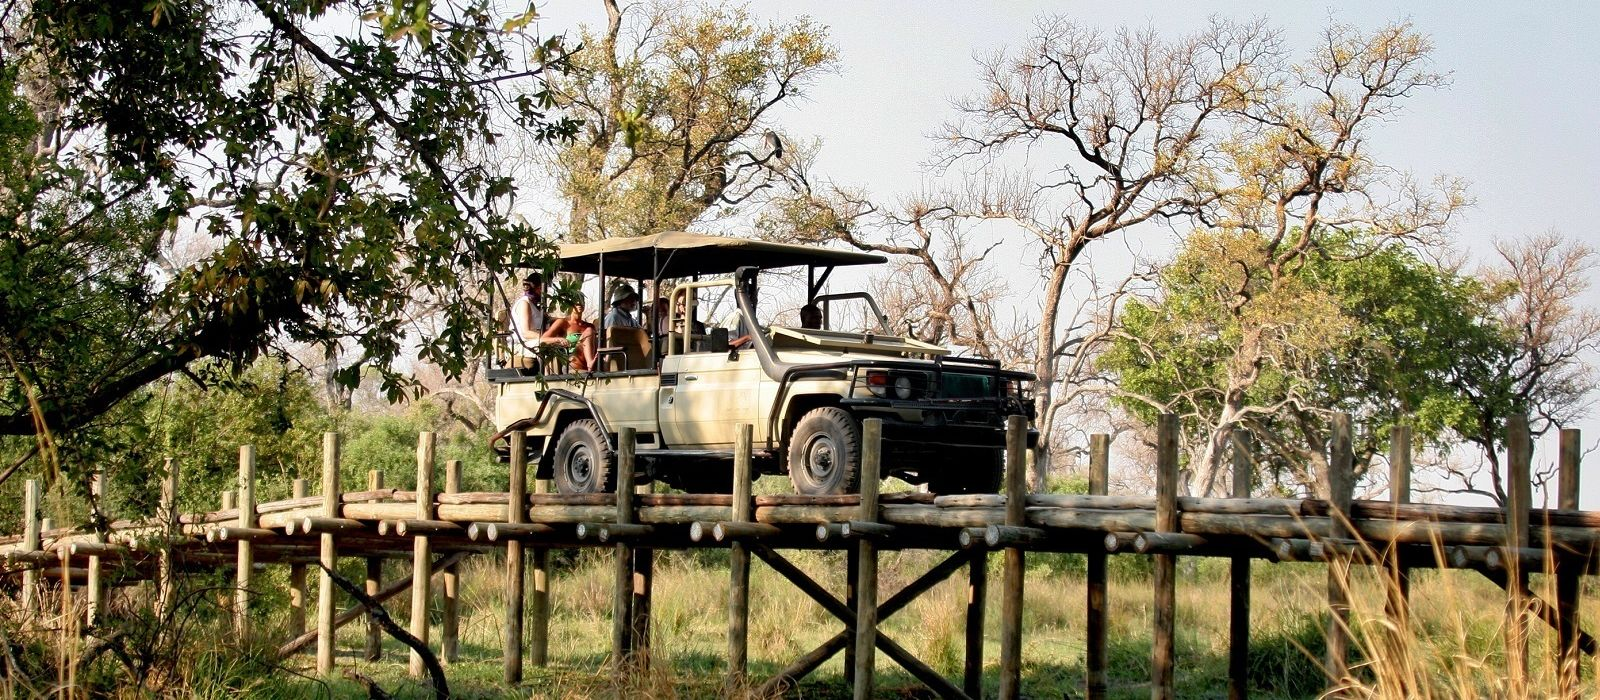 Botswana: Your Wildest Dreams Tour Trip 8